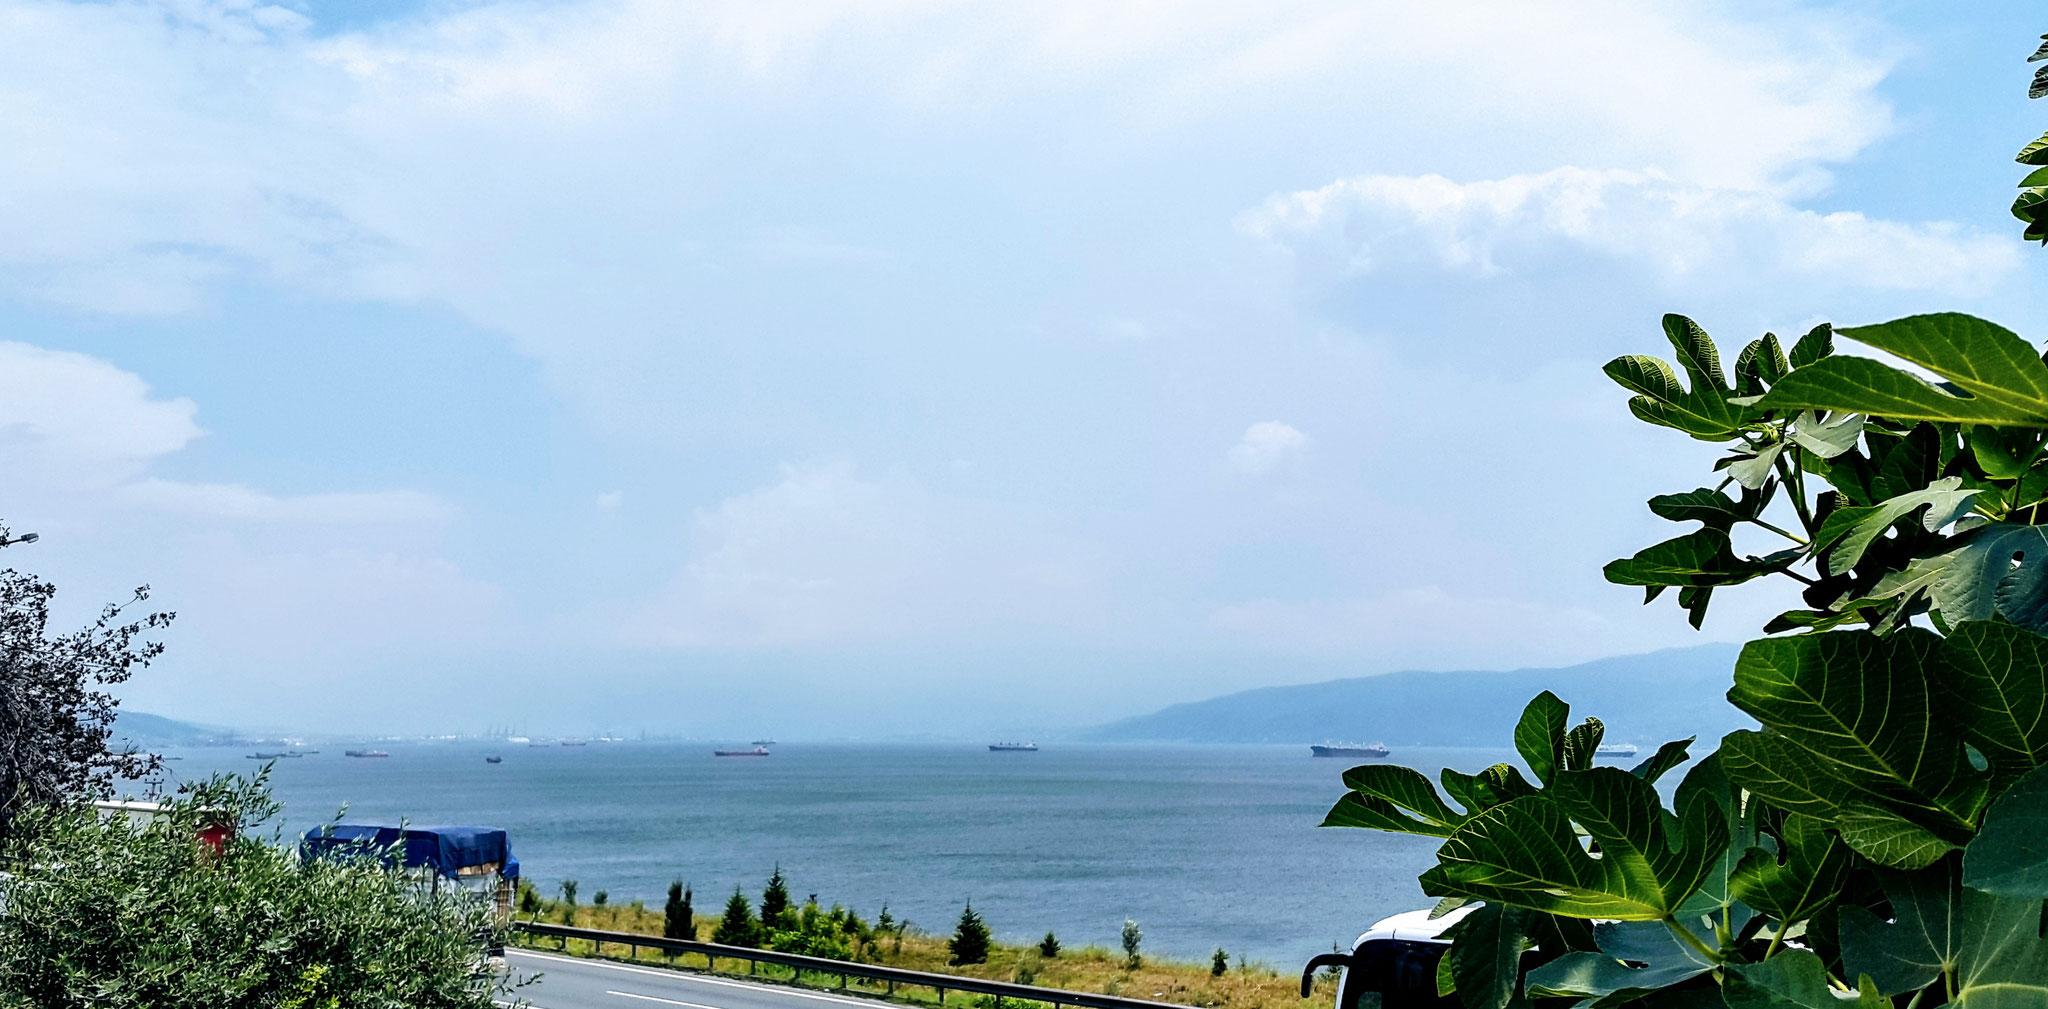 Am Marmara-Meer angekommen